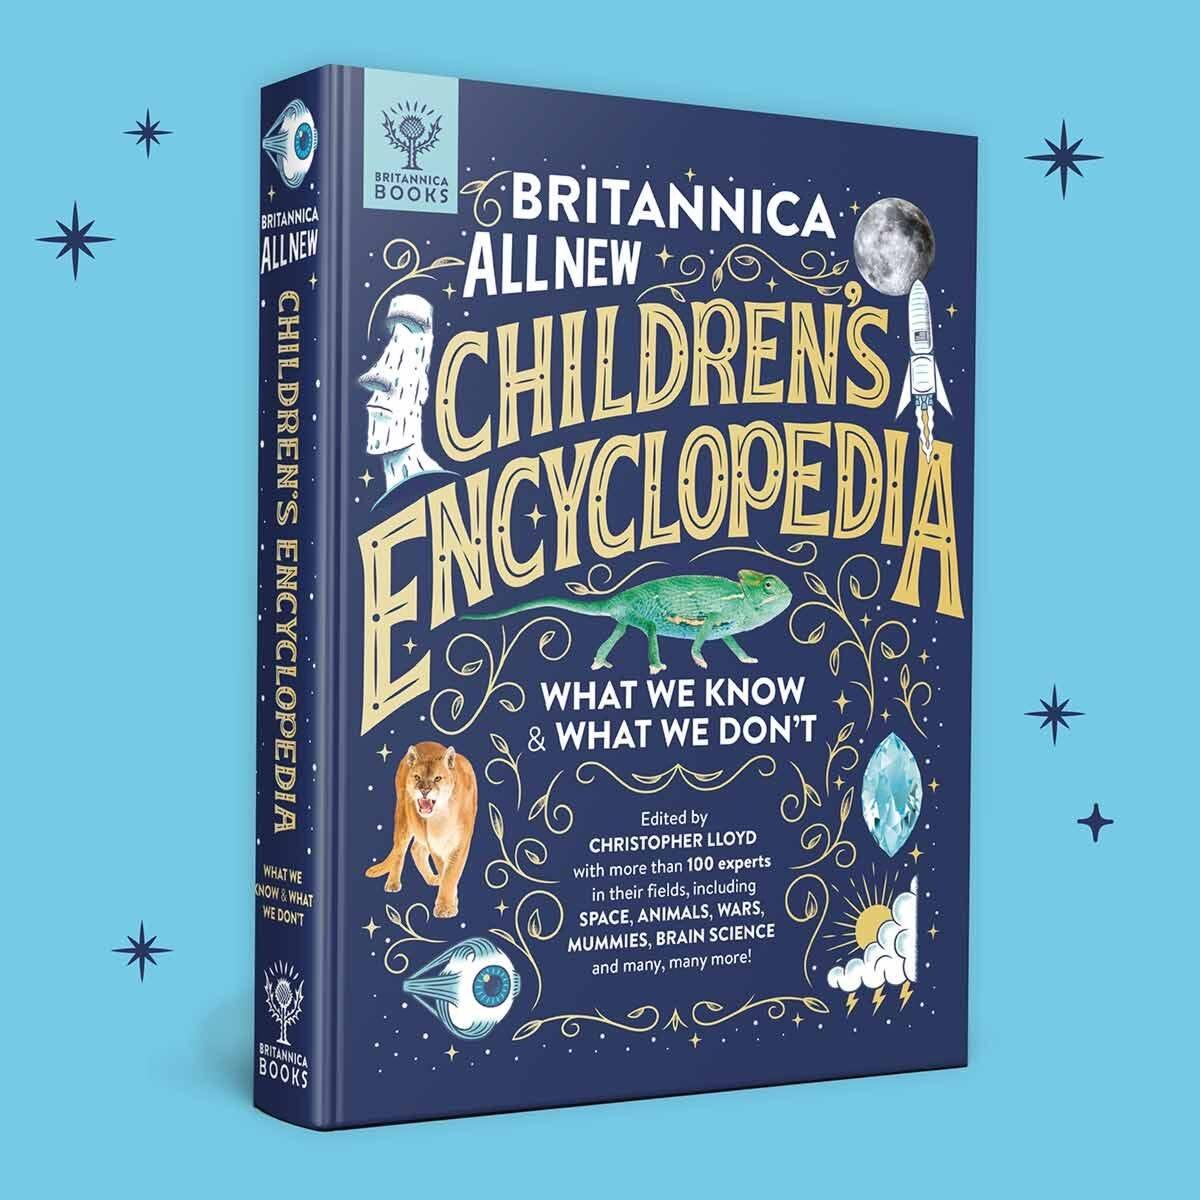 Britannica All New Childrens Encyclopedia